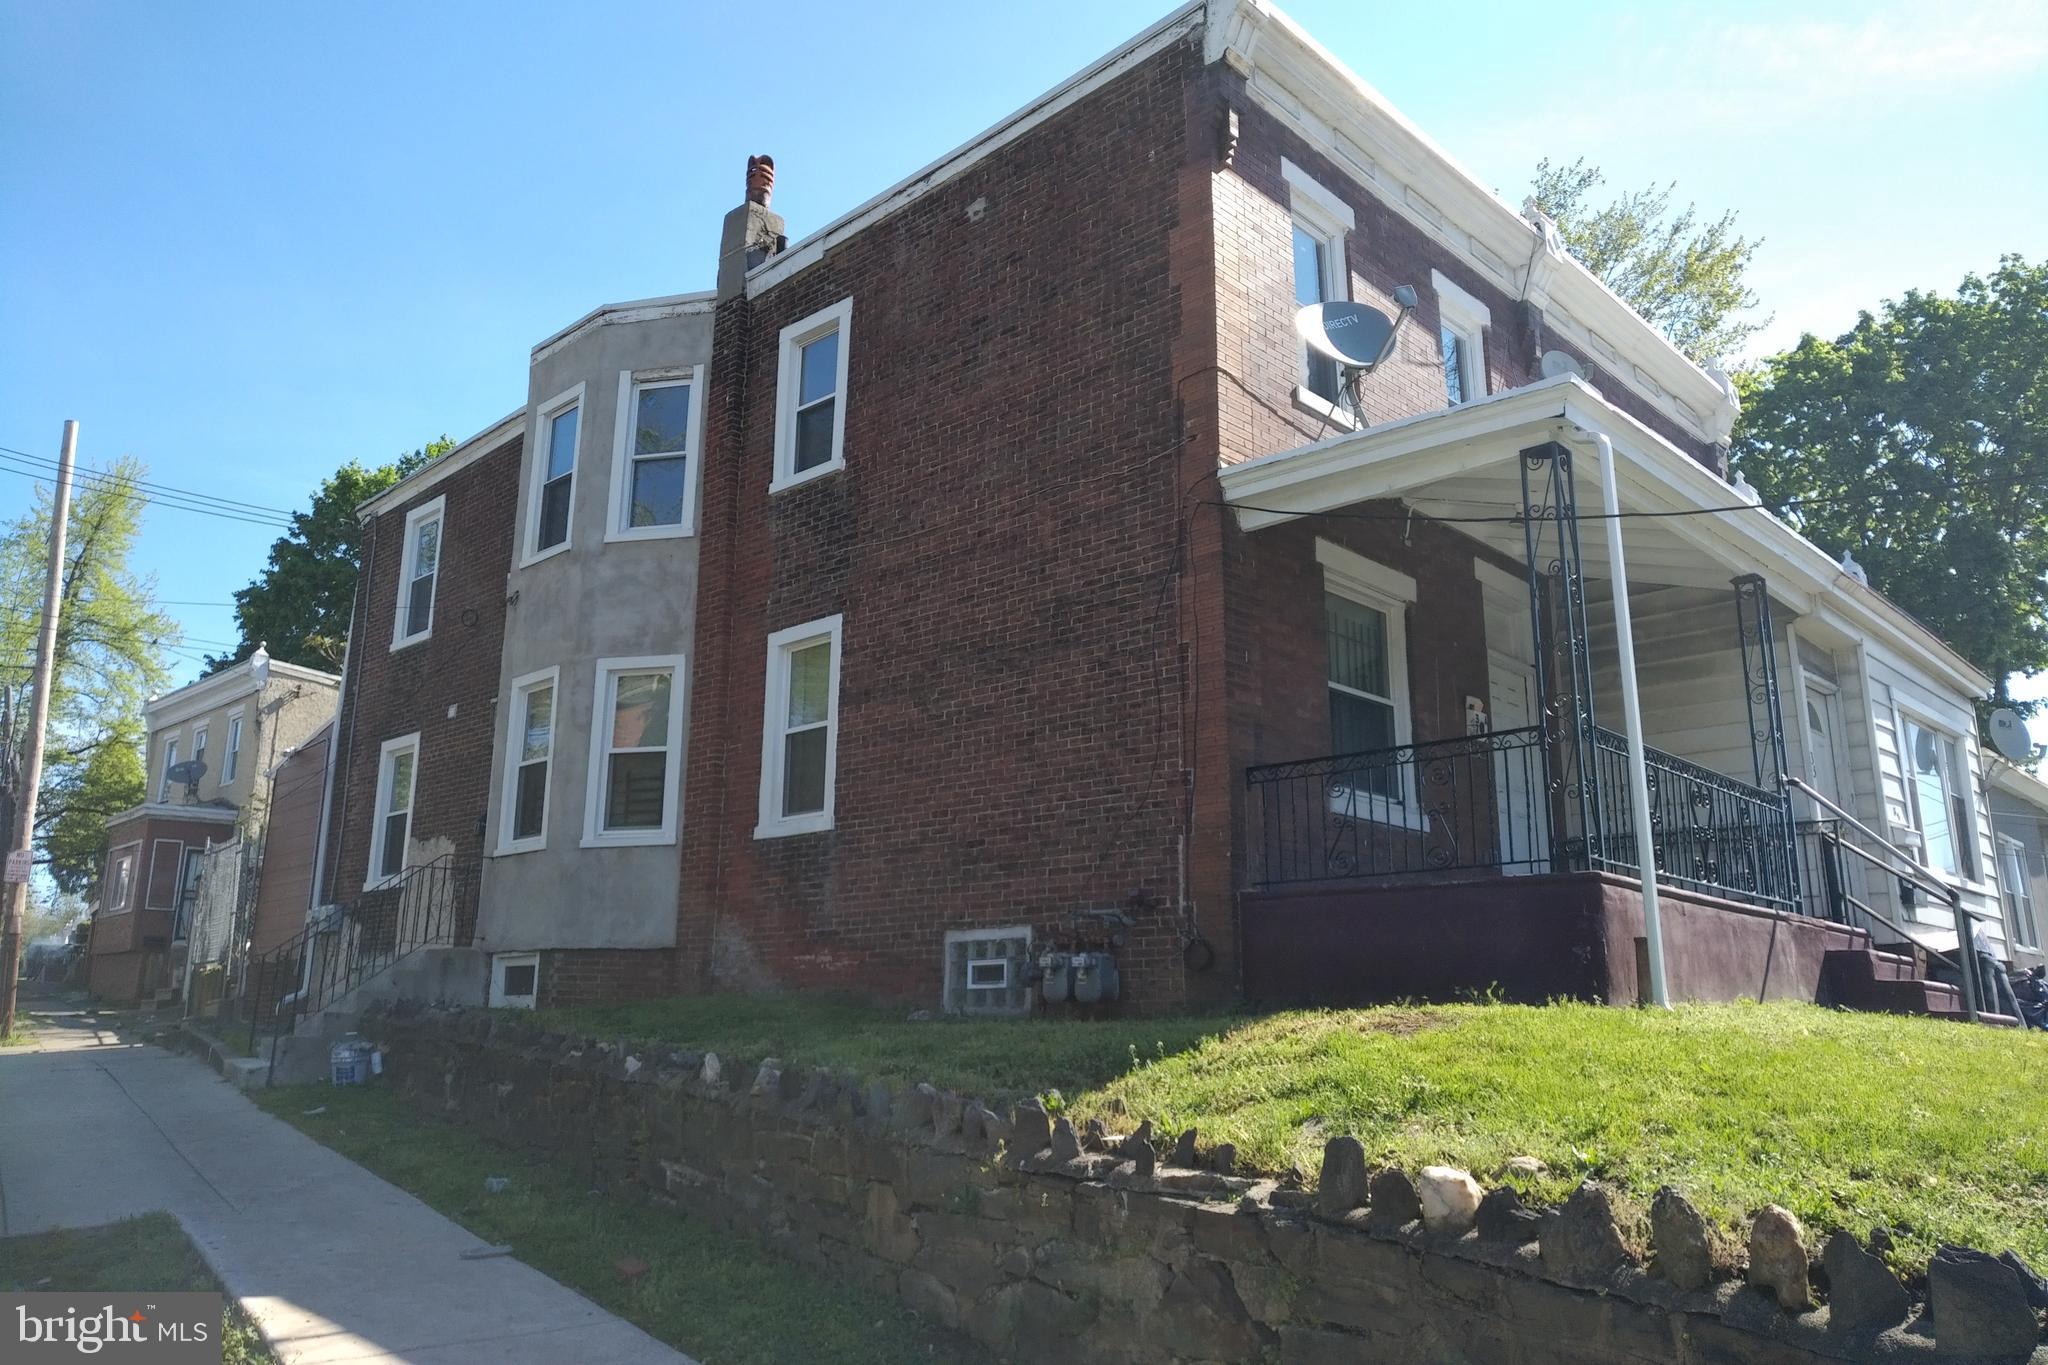 37 Main Street, Darby, PA 19023